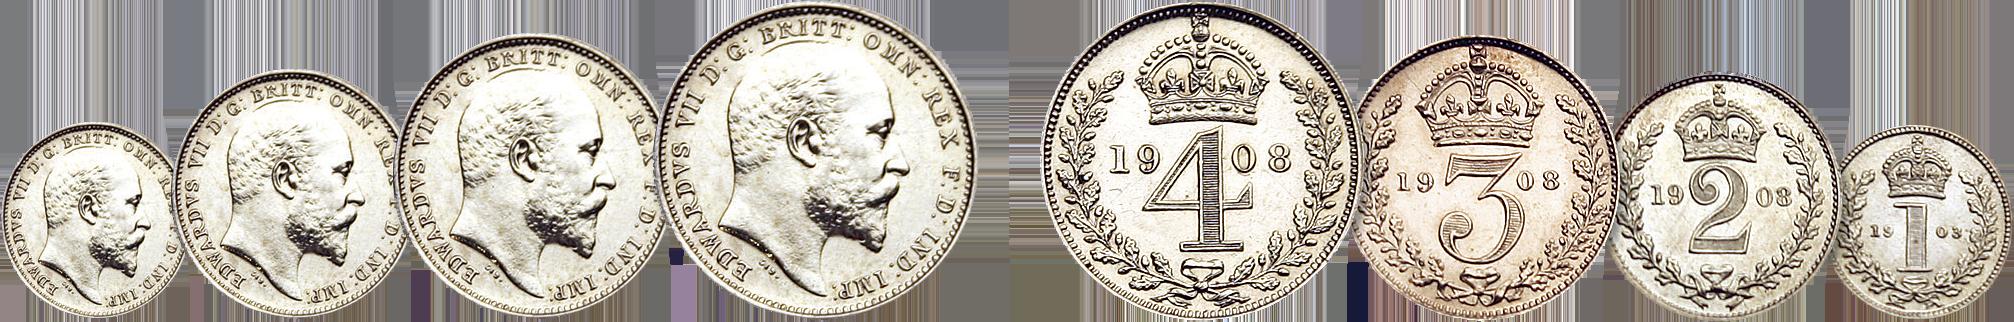 Skjærtorsdagmyntene Edward VII 1908